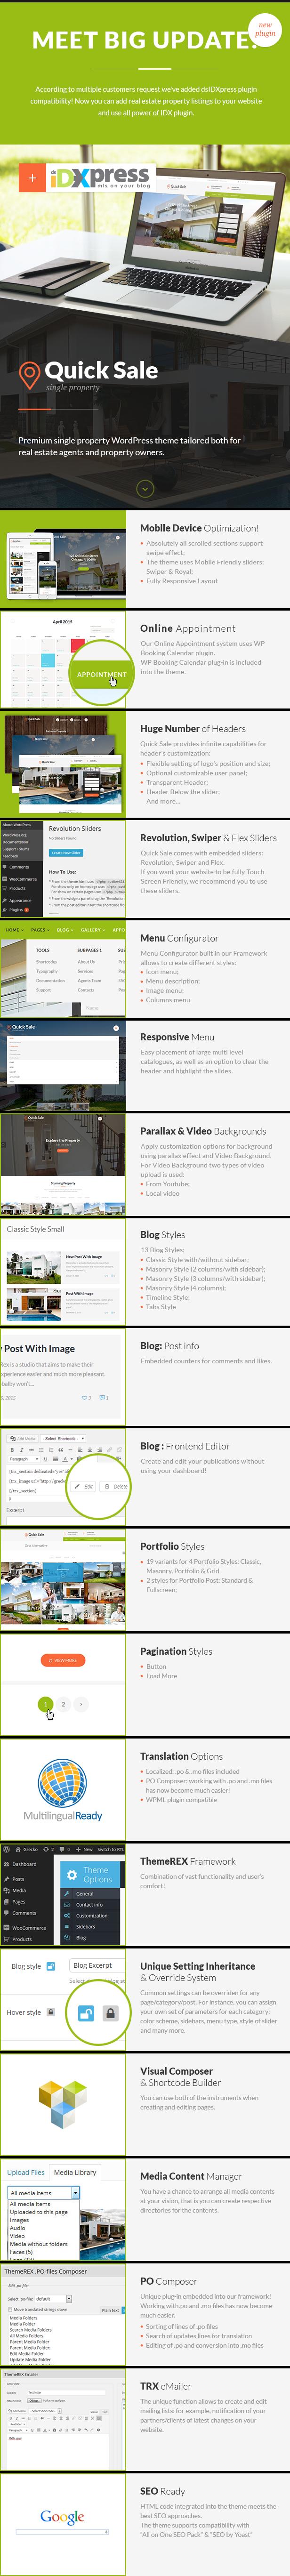 Quick Sale | Single Property Real Estate WordPress Theme - 2